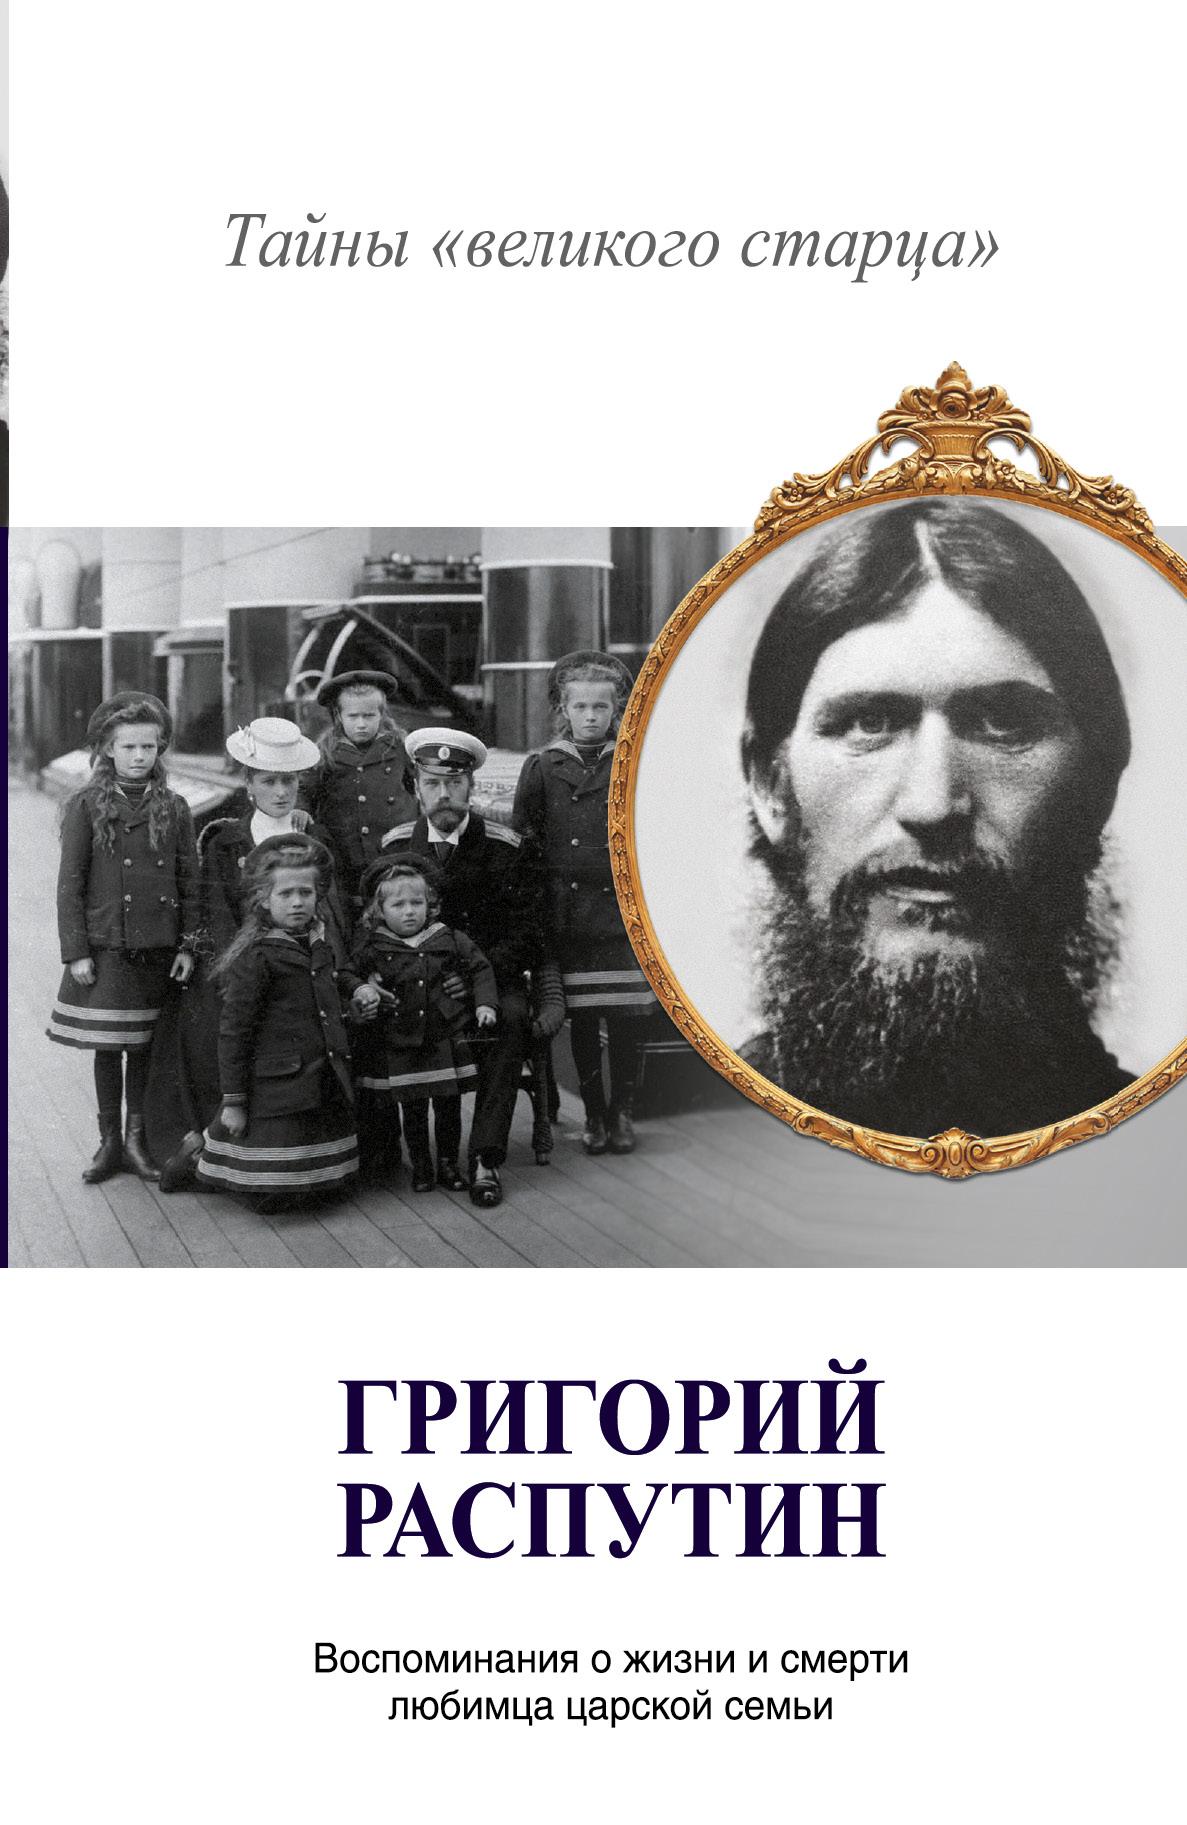 Распутин: оргии в царском дворе (Rasputin: orgy in the ...